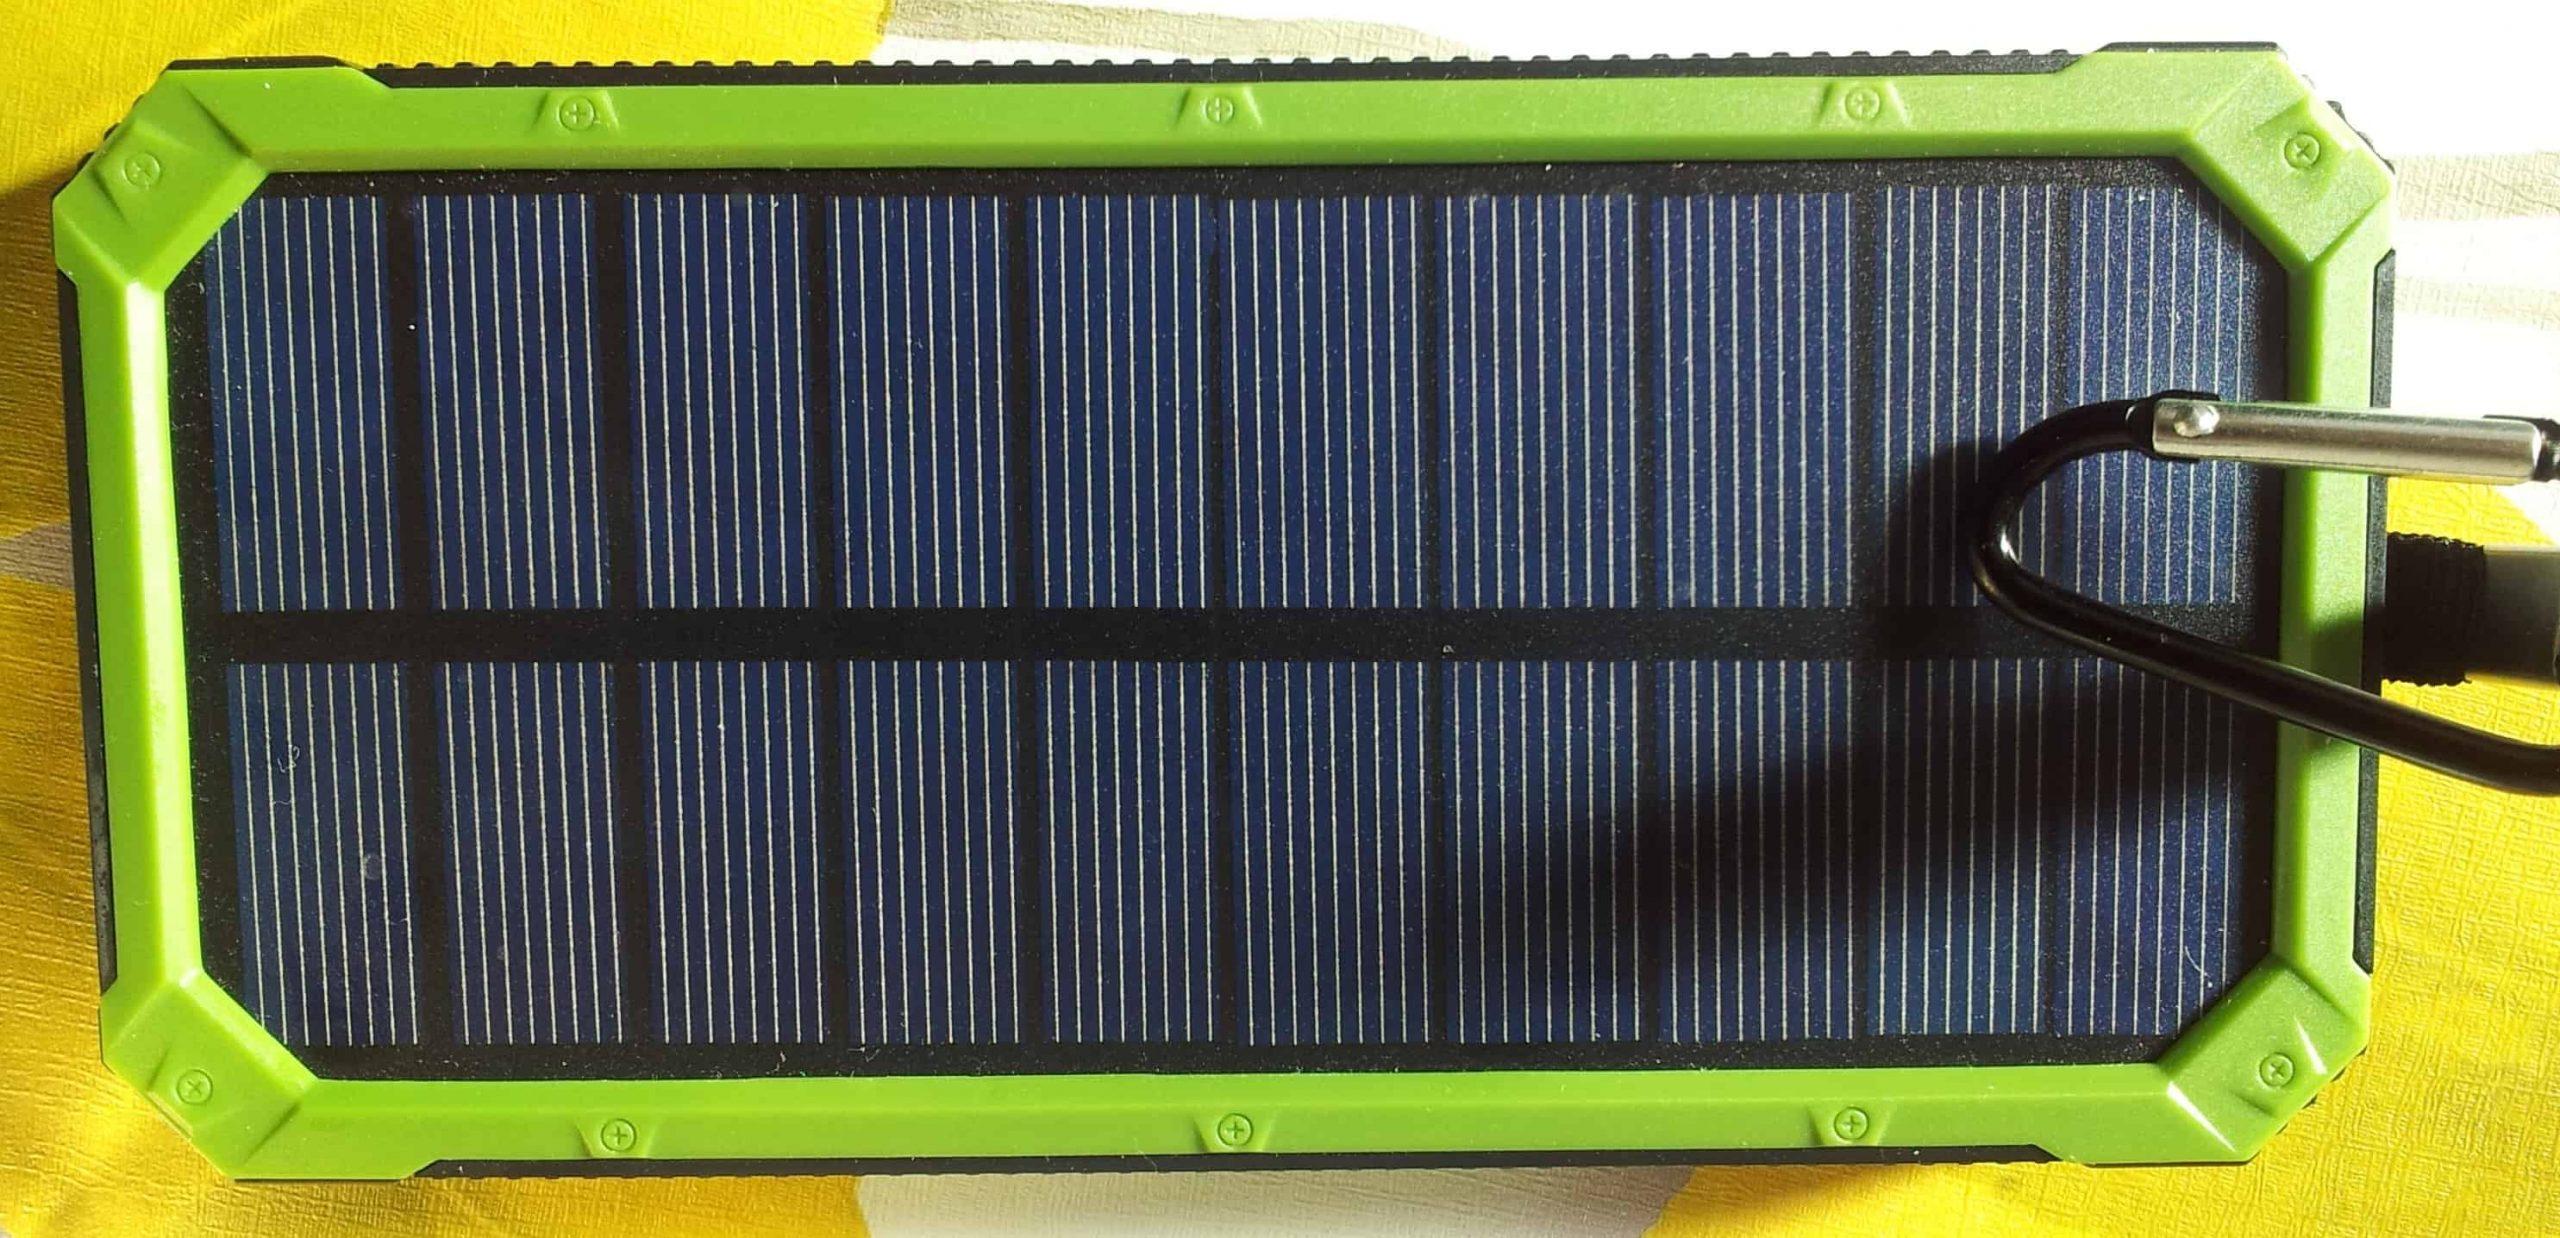 Cargador solar móvil: ¿Cuál es el mejor del 2020?